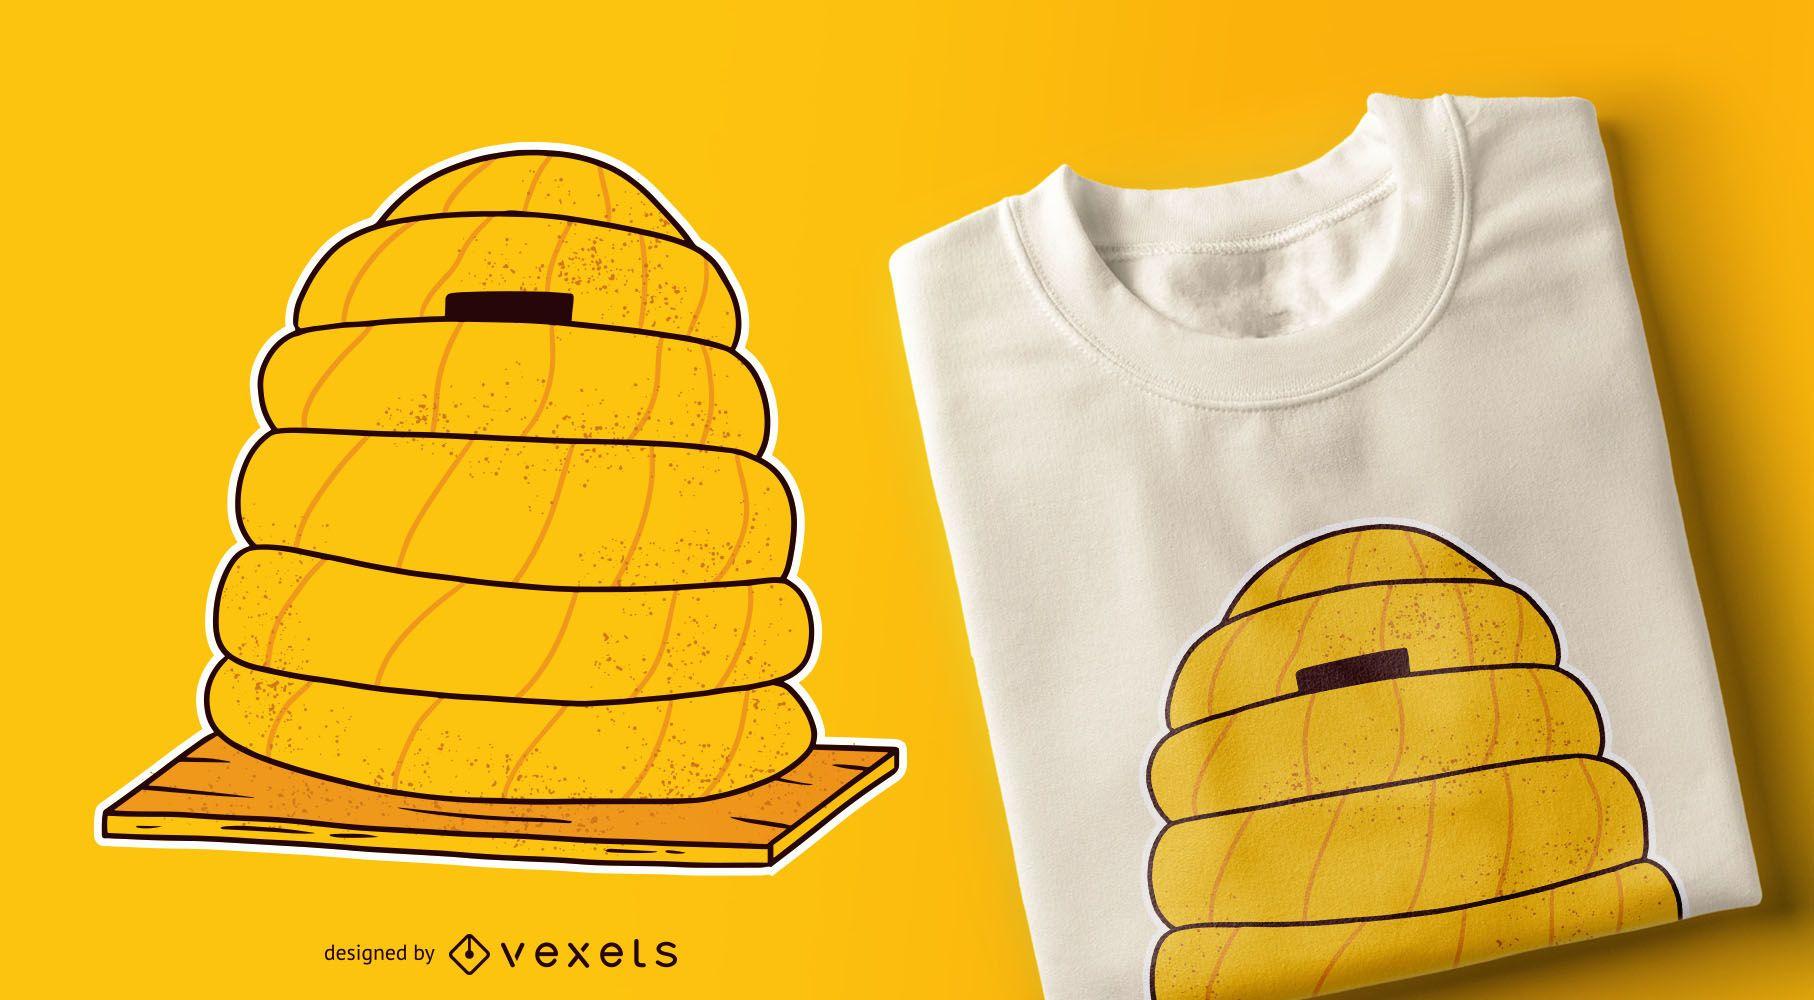 Beehive yellow t-shirt design